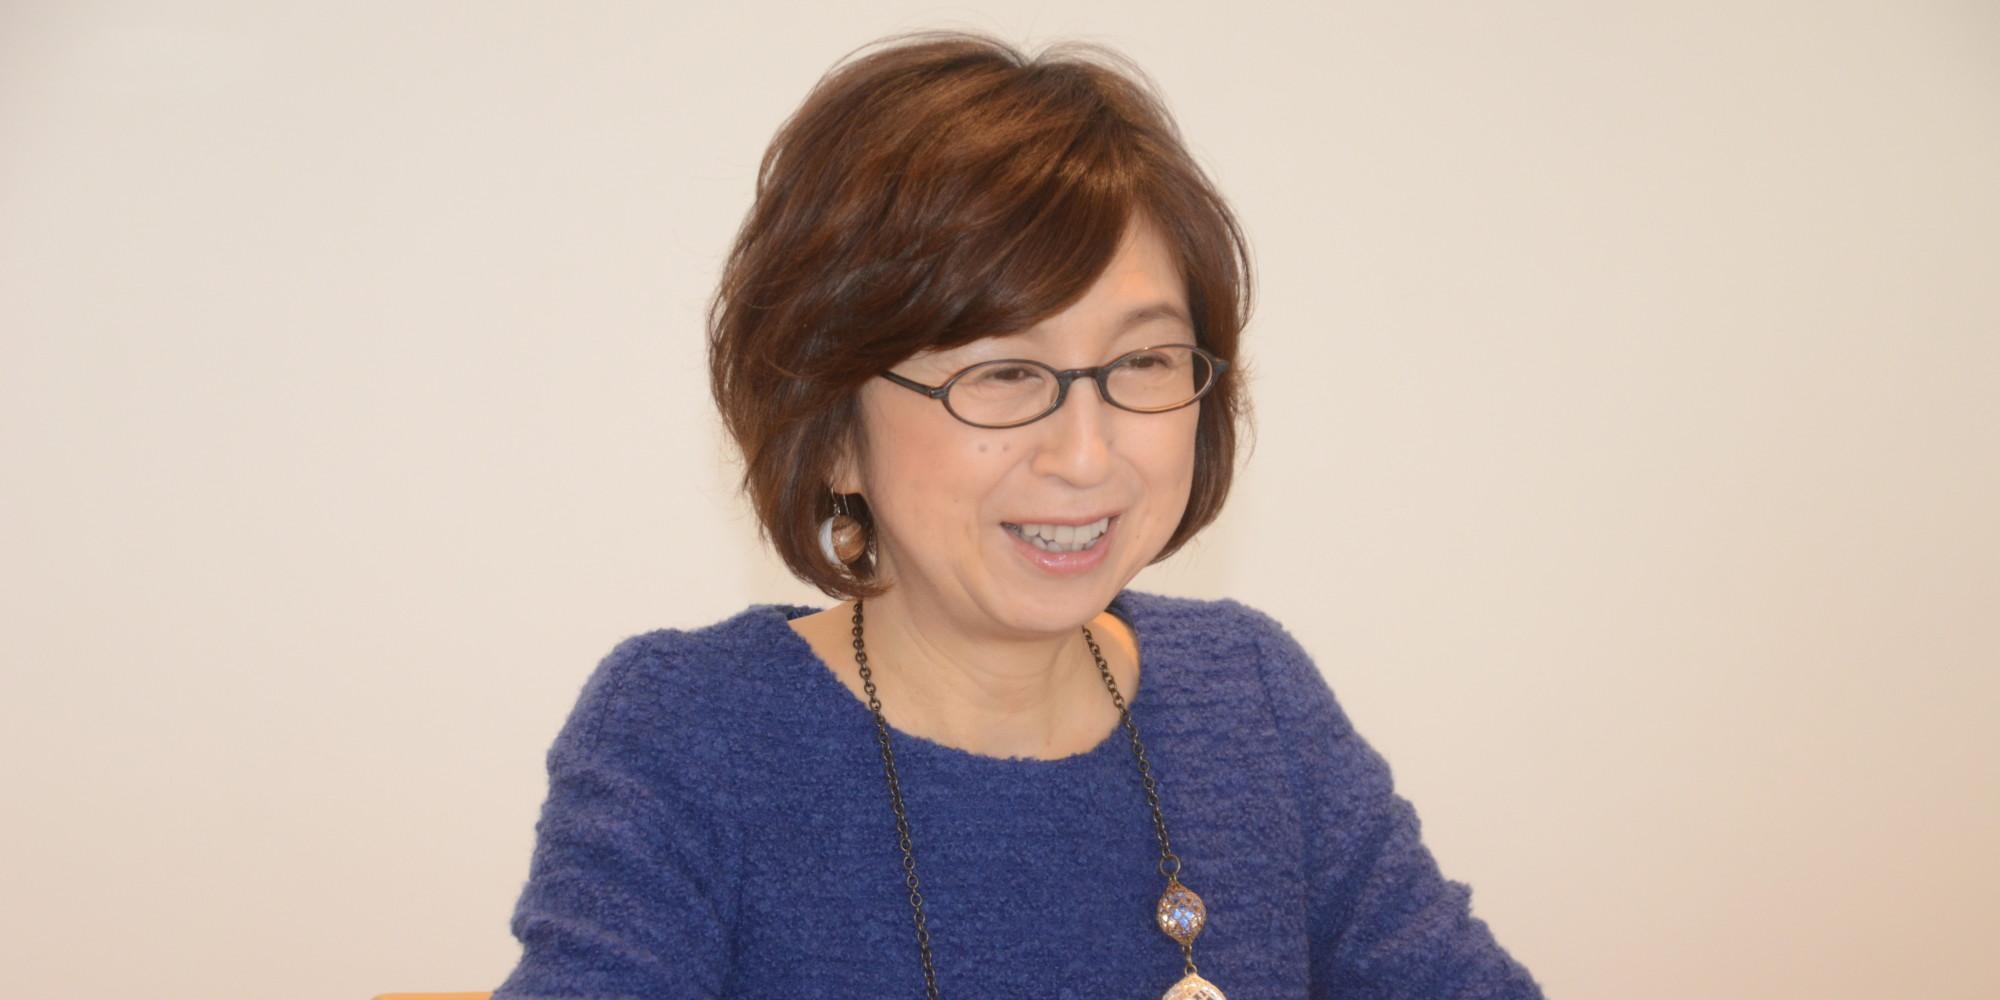 DeNA創業者の南場智子さん「プログラミング教育... 南場智子さん「プログラミング教育で日本か